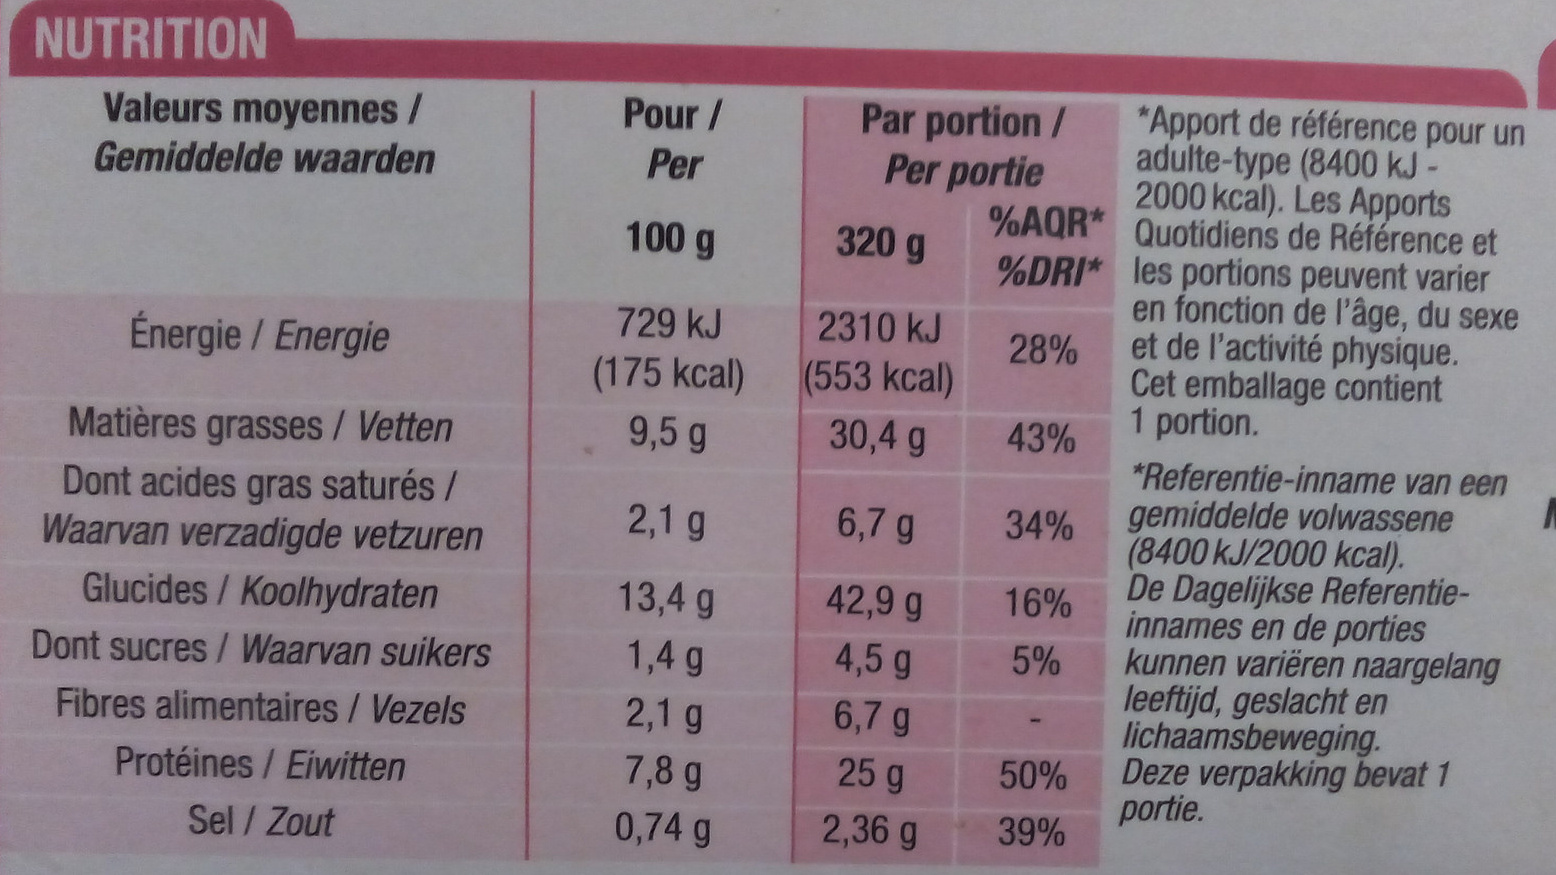 Salade de pâtes, Jambon, œuf, emmental - Nutrition facts